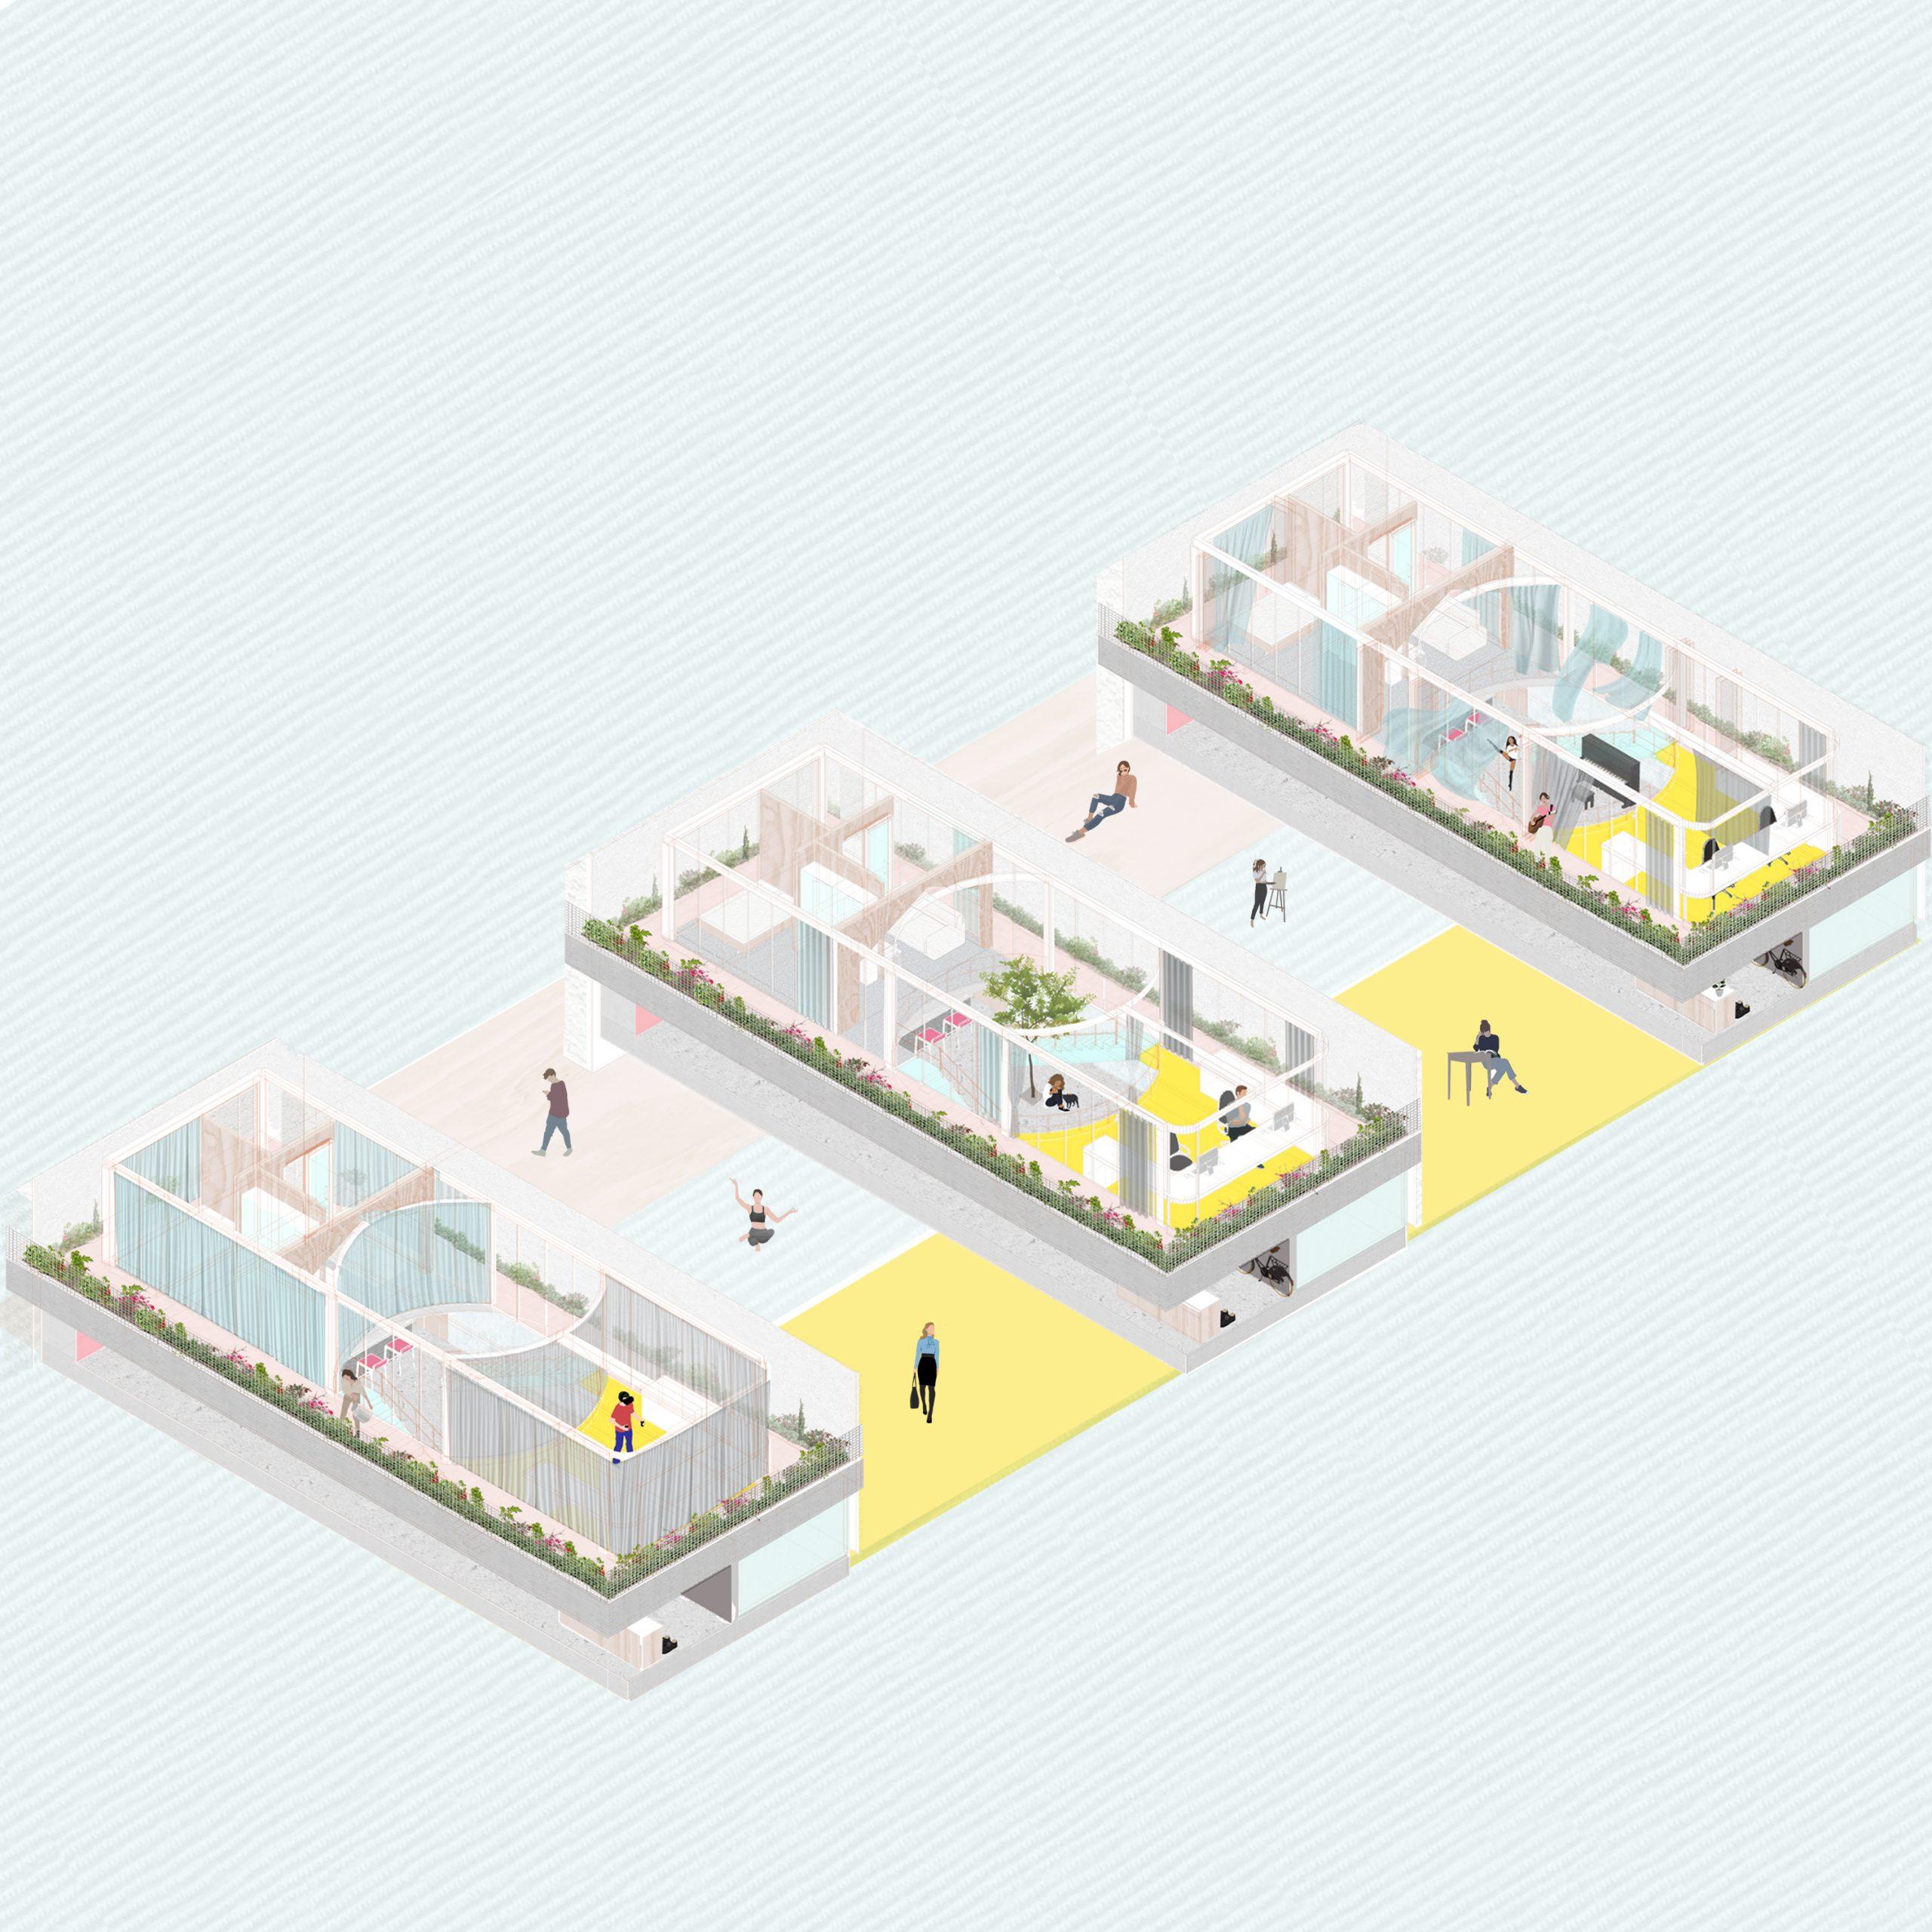 Home -office whit a gap - by Gerardo Fosado Rodríguez